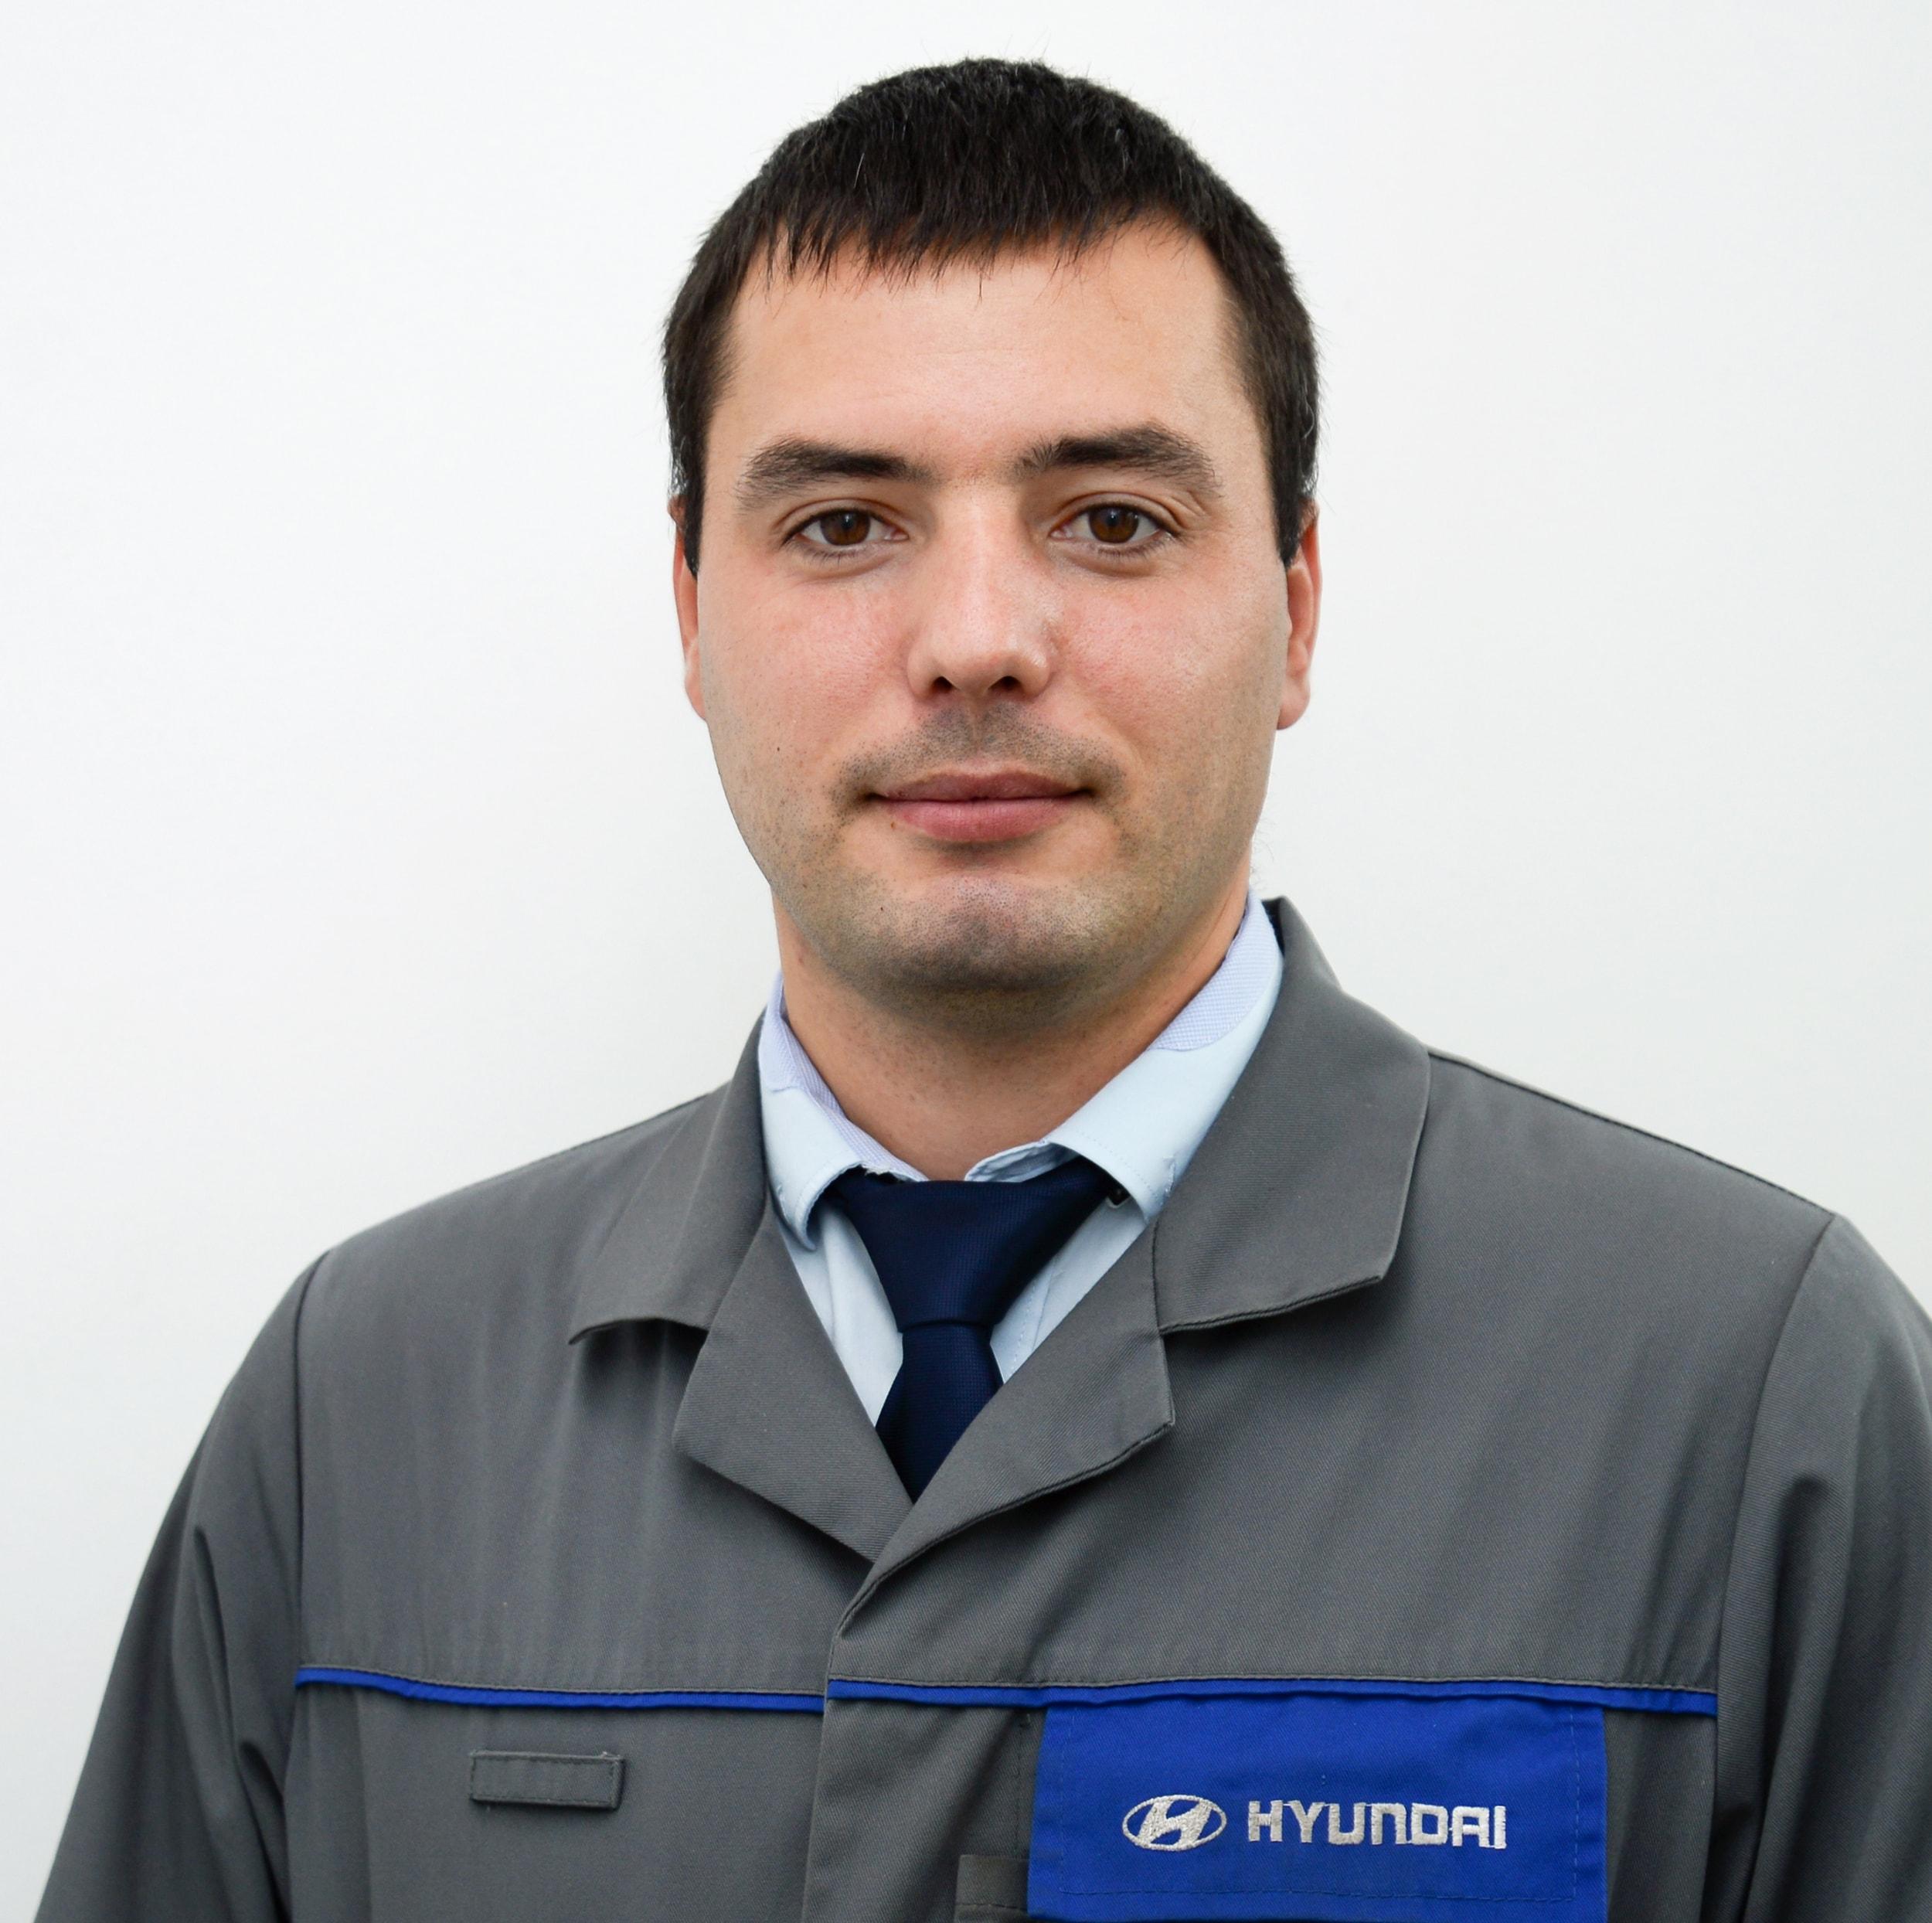 Абрамов Анатолий